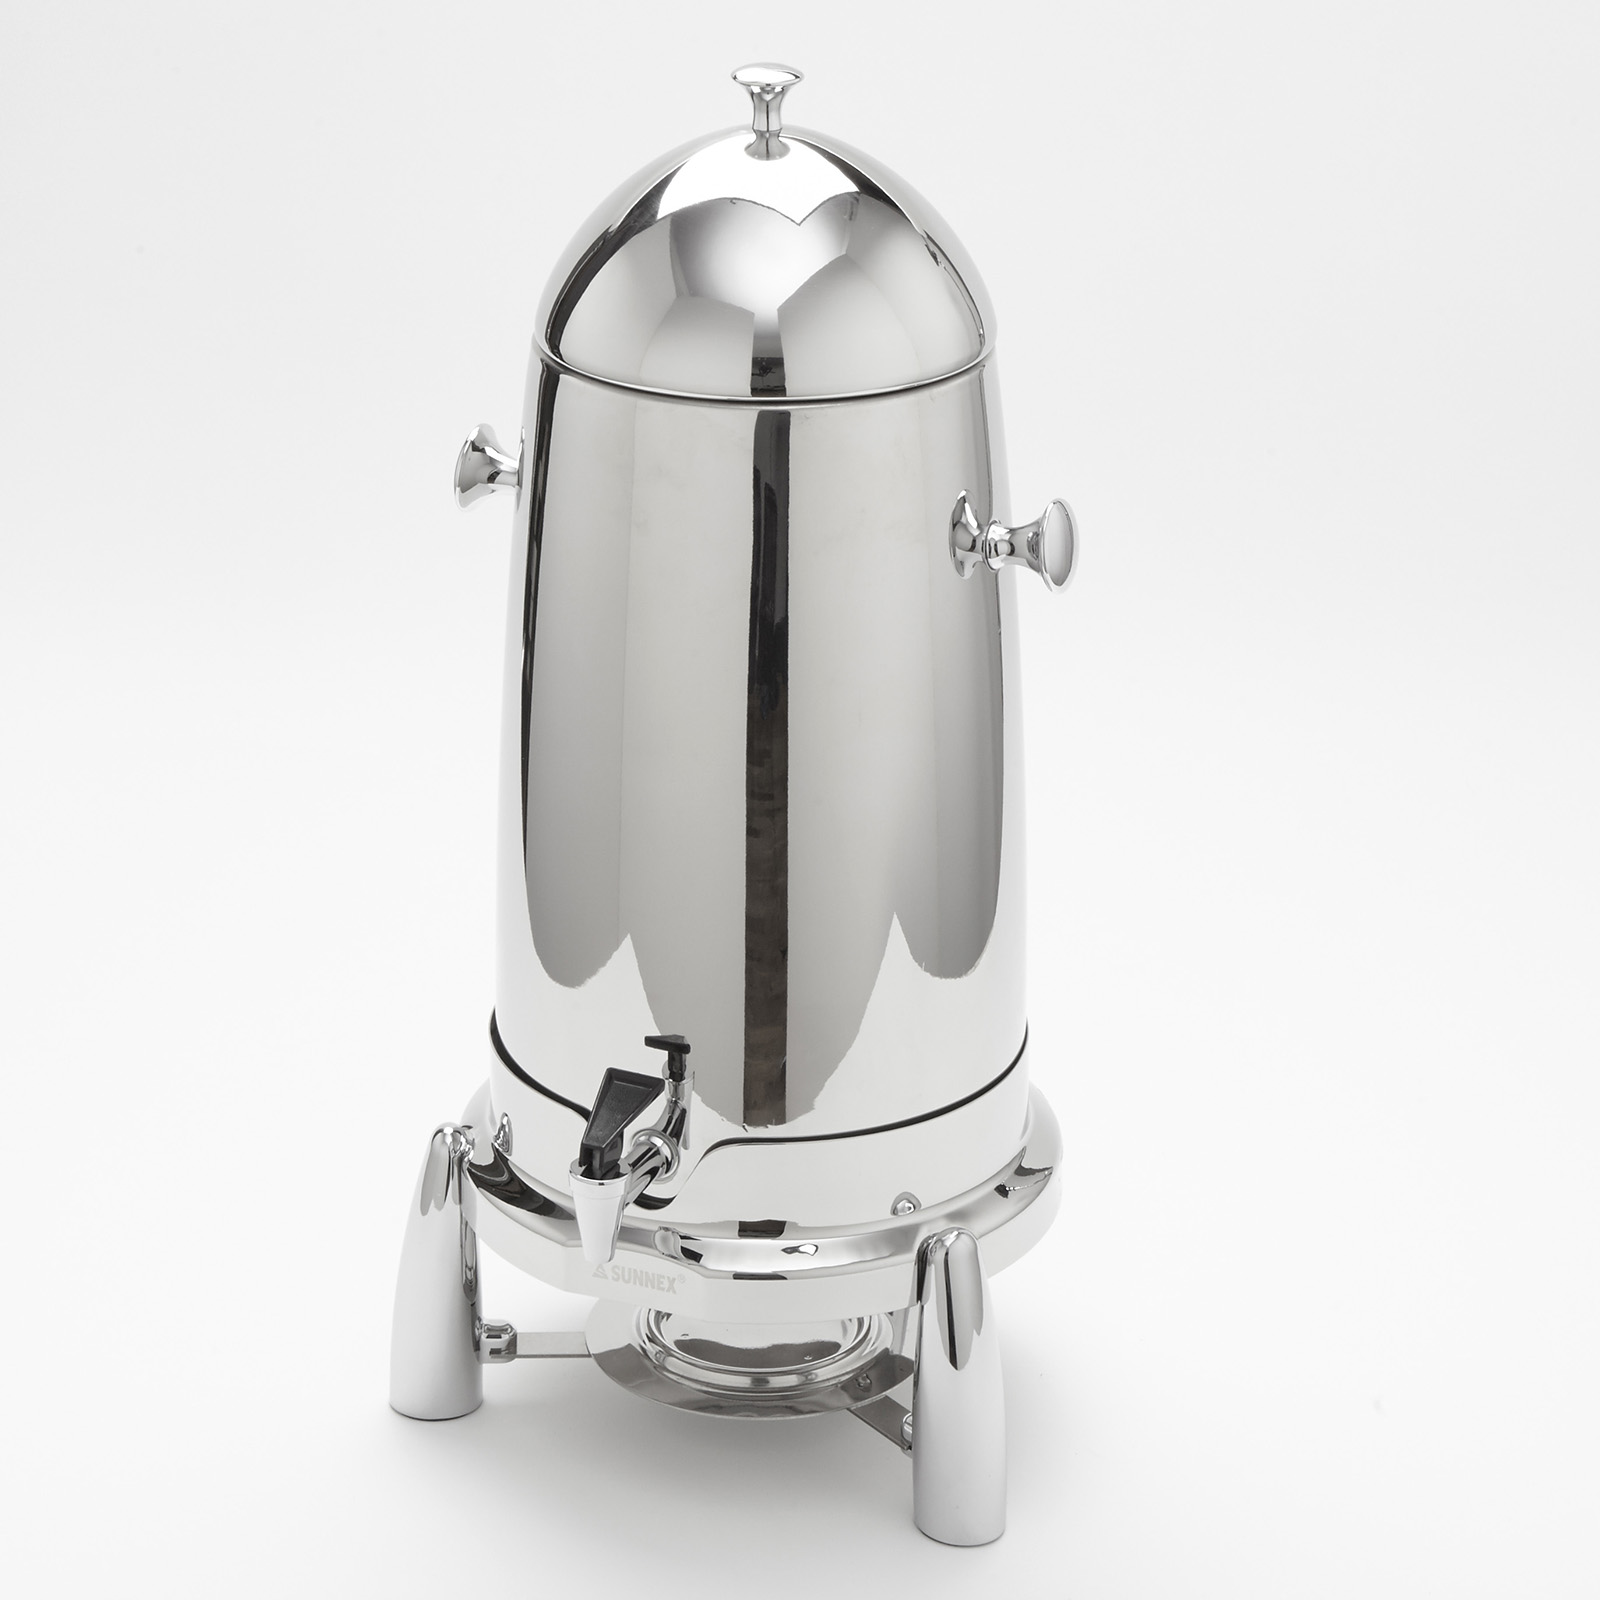 American Metalcraft REVLOSCU12 coffee chafer urn